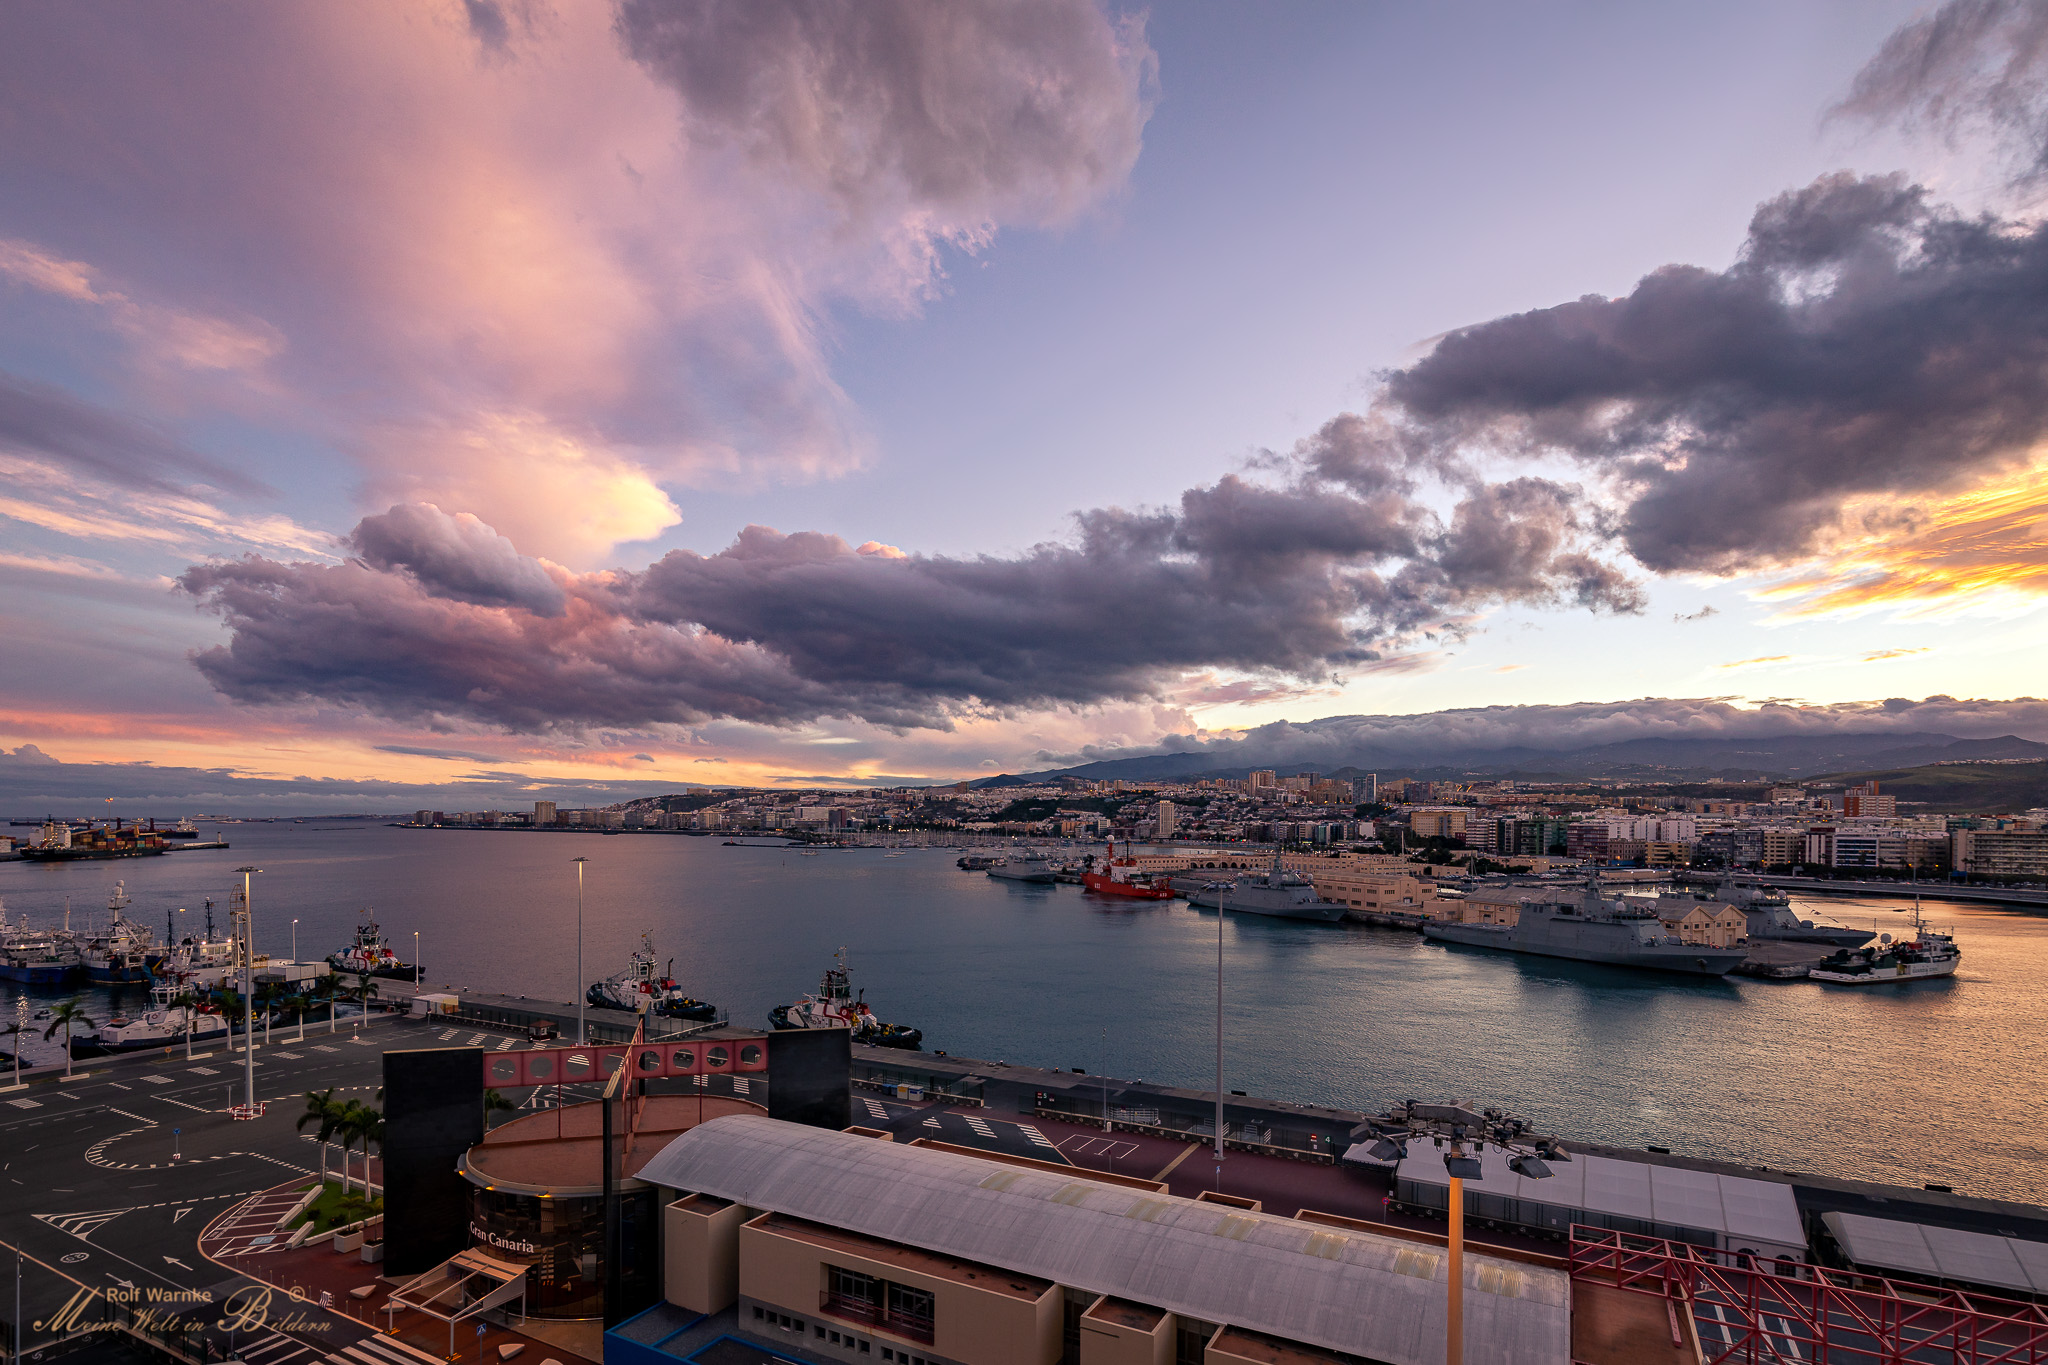 Cruise Center Las Palmas Gran Canaria, Spain